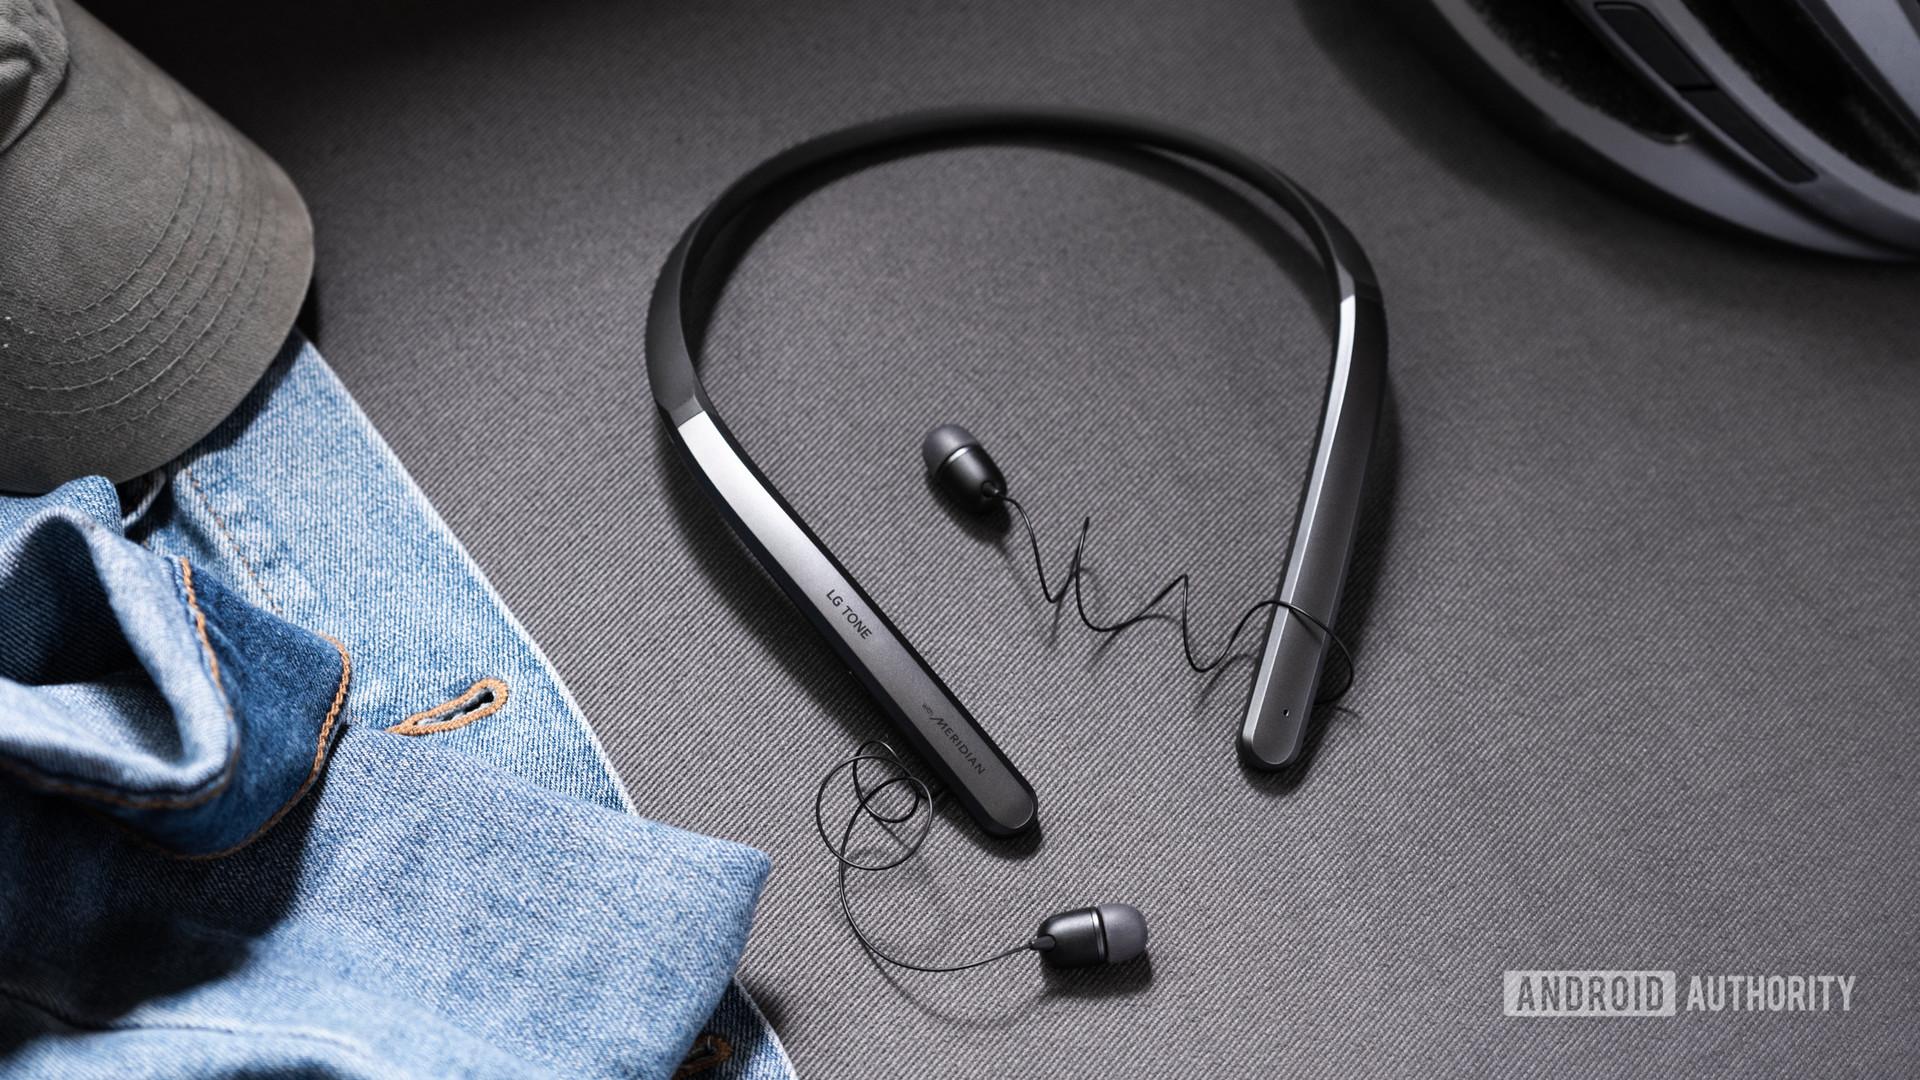 LG Tone Flex XL7 neckbuds